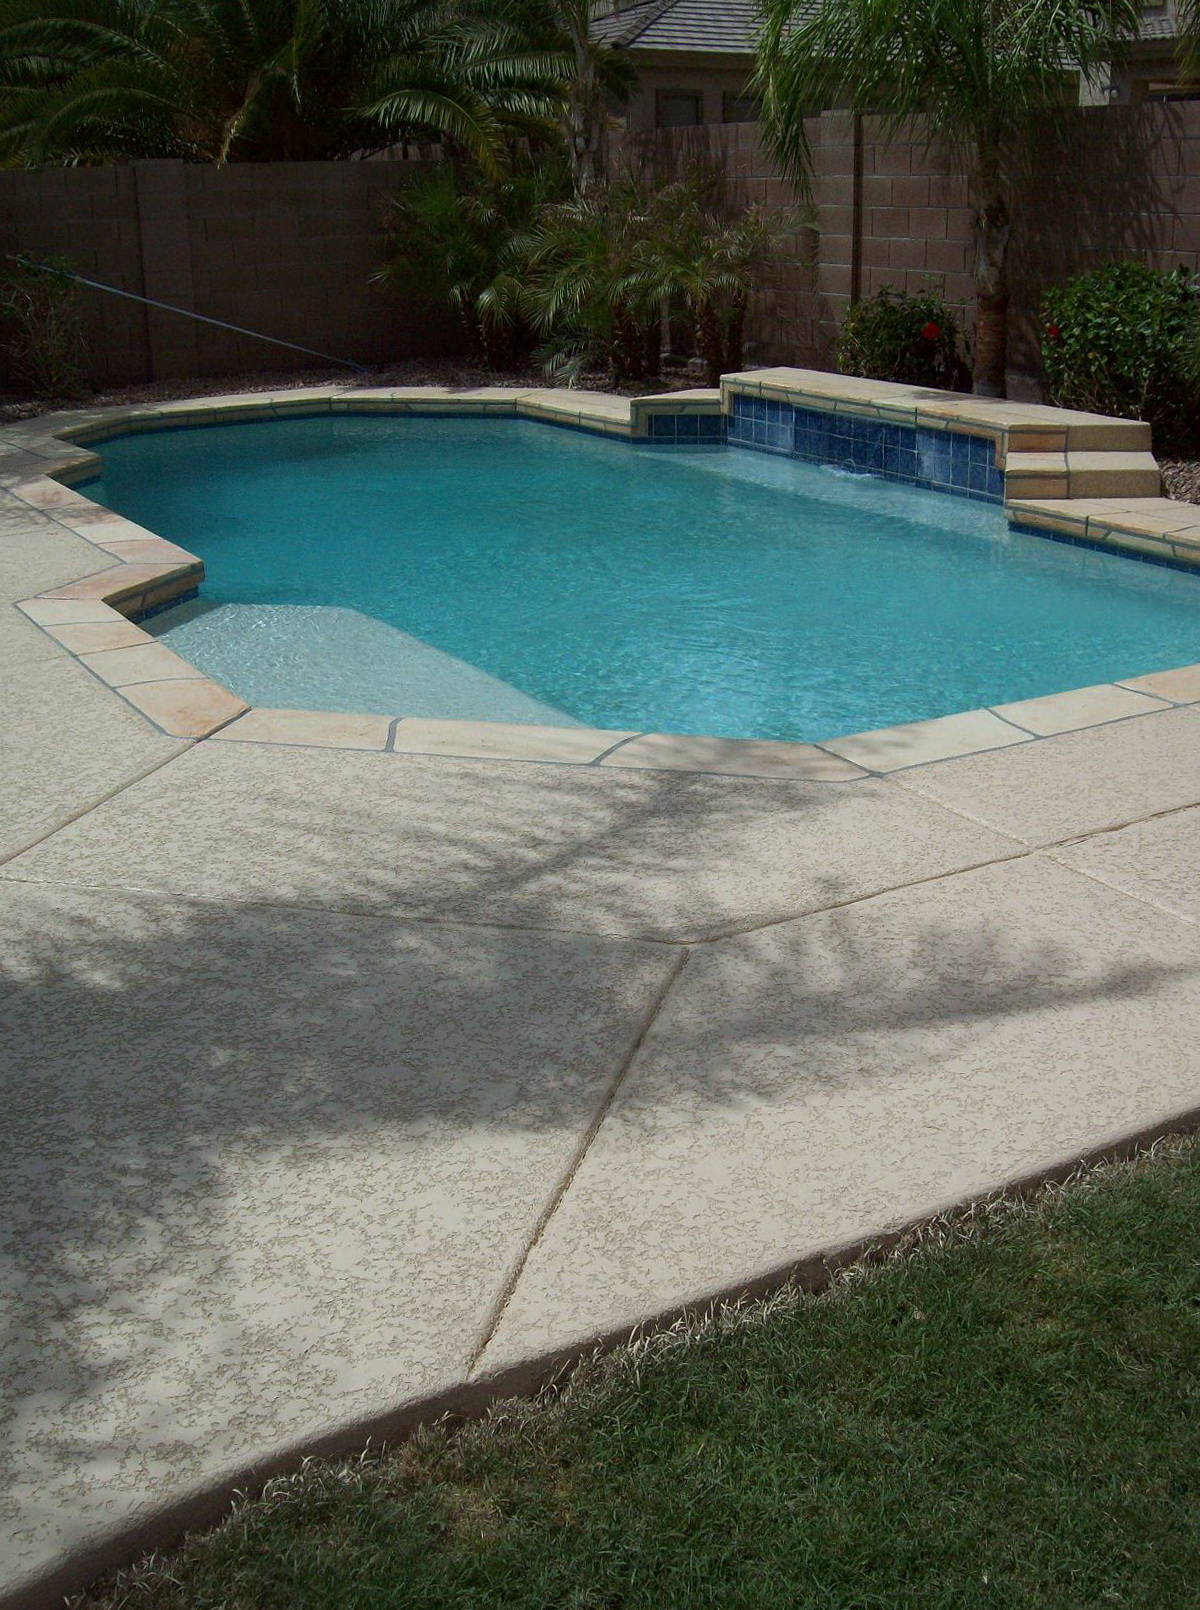 Acrylic Pool Deck Resurfacing Cost